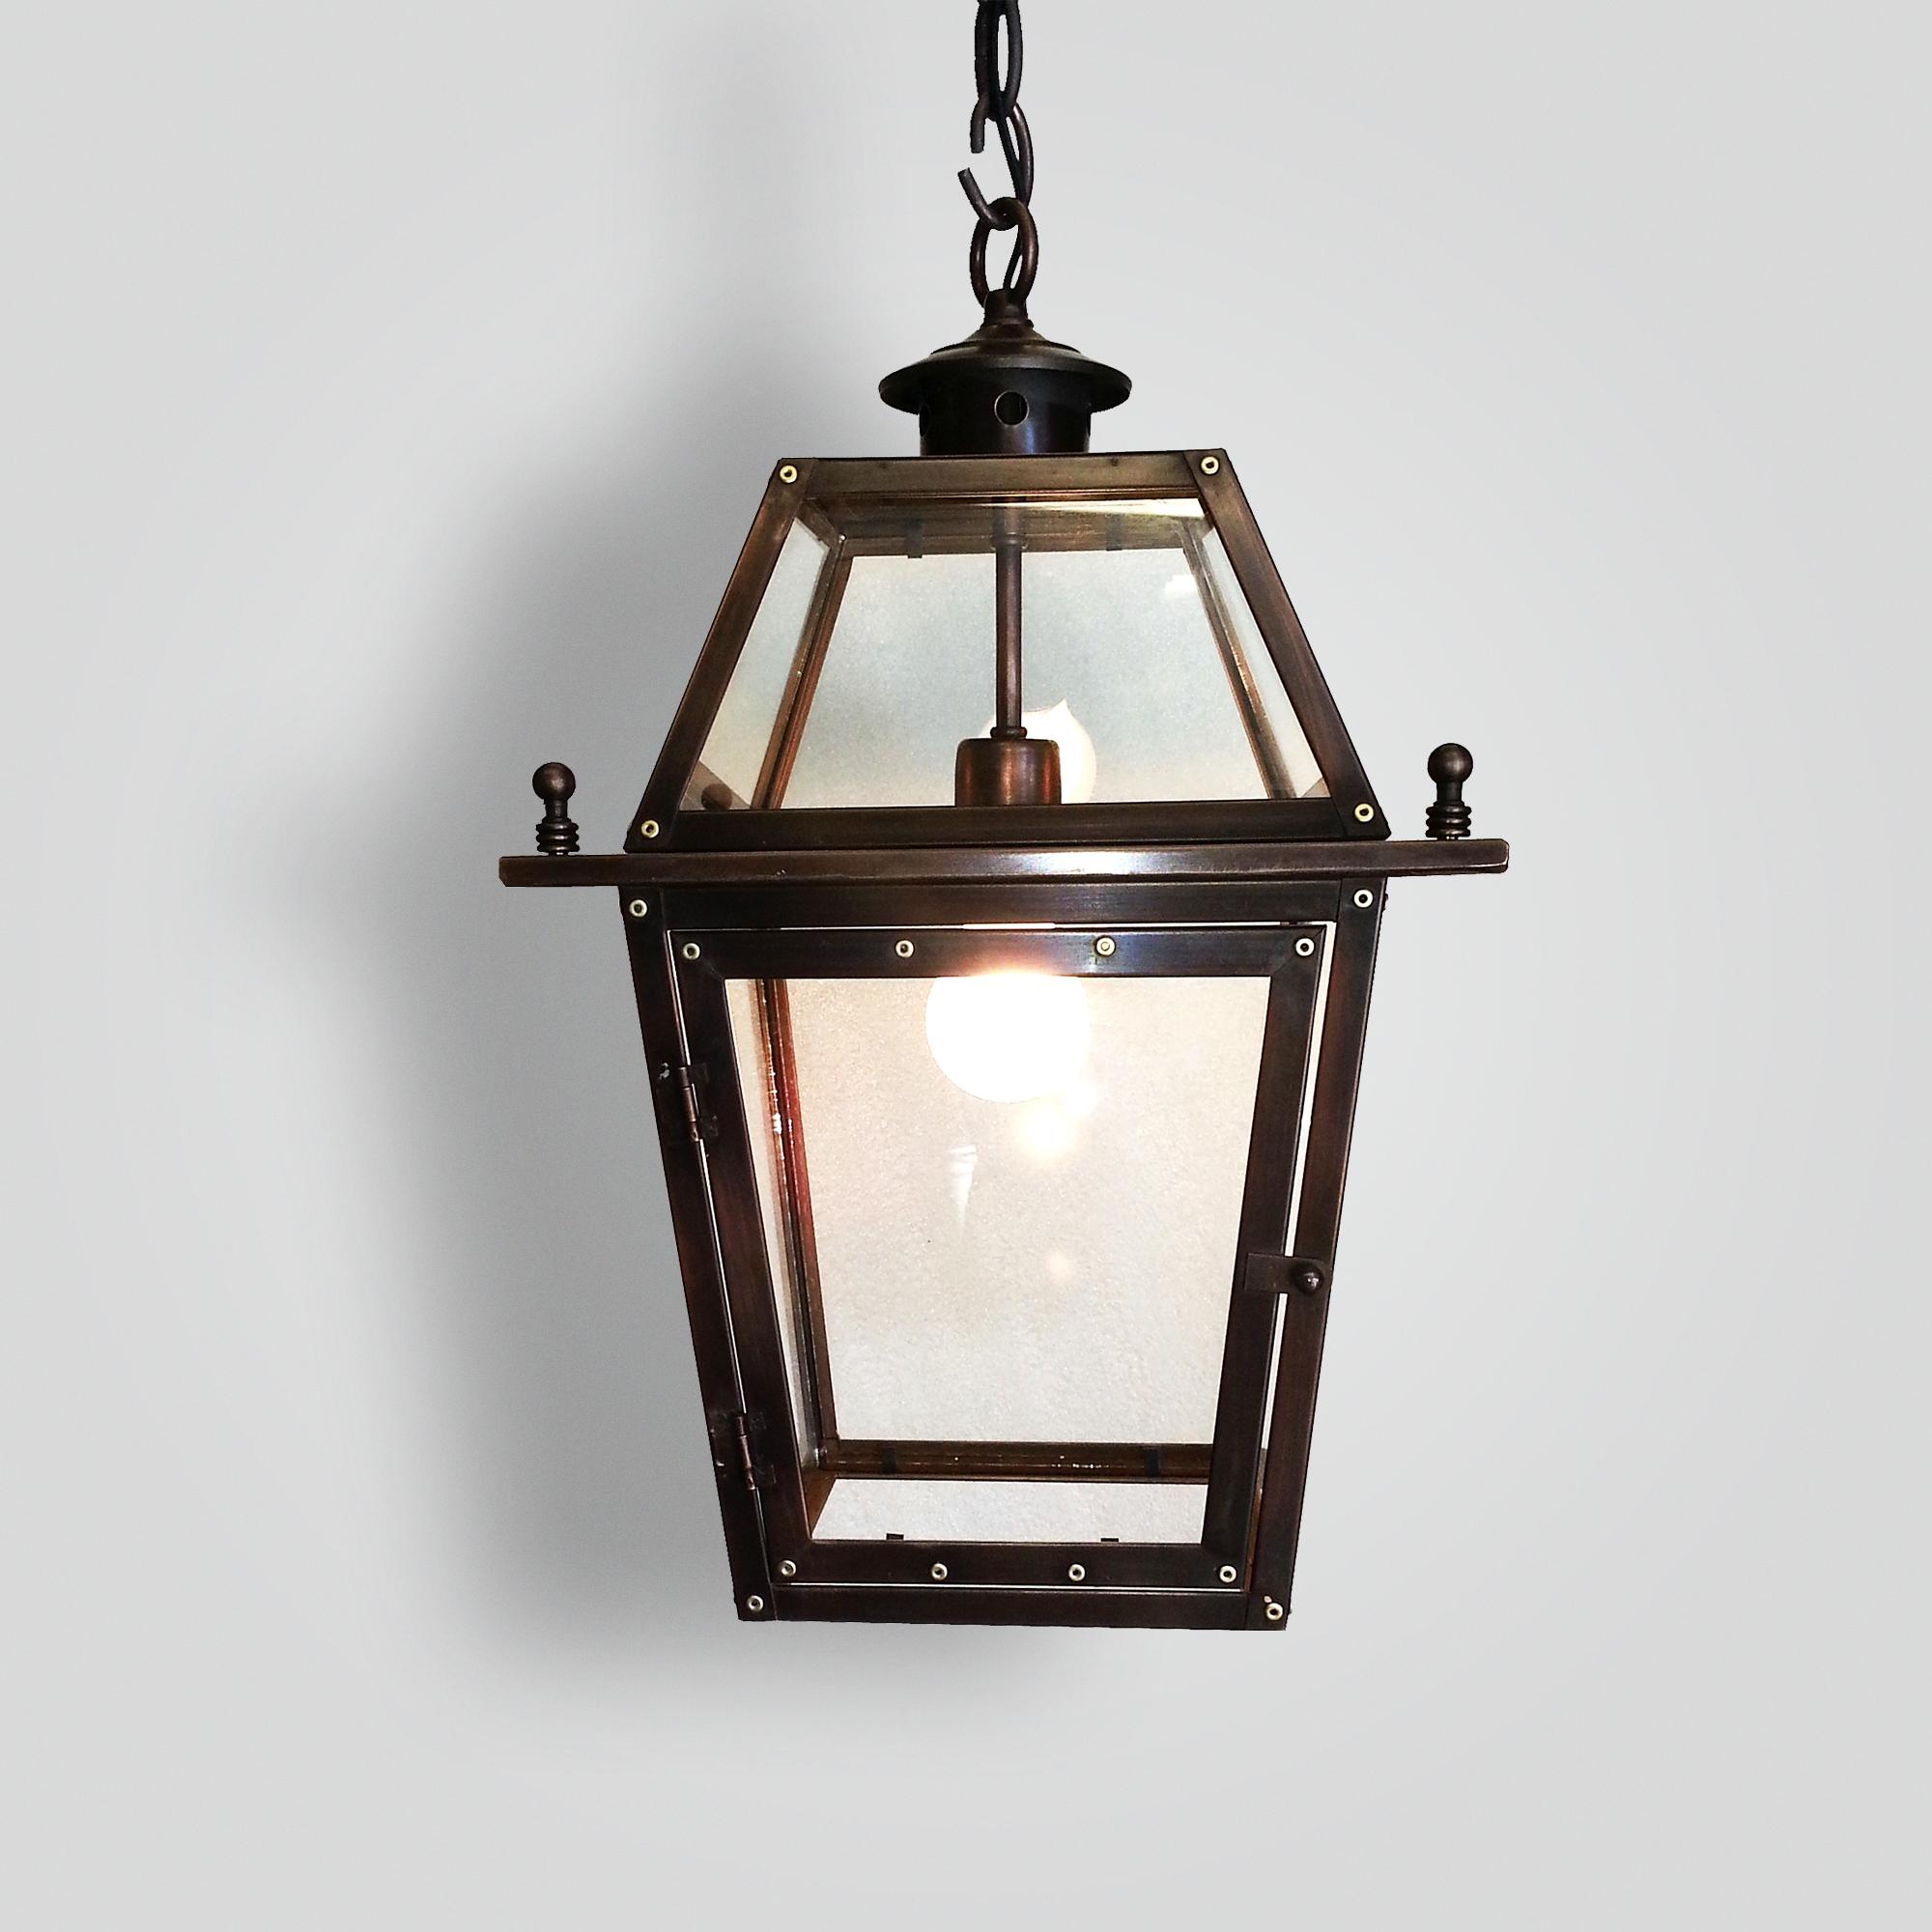 550-mb1-br-h-sh Pendant – ADG Lighting Collection